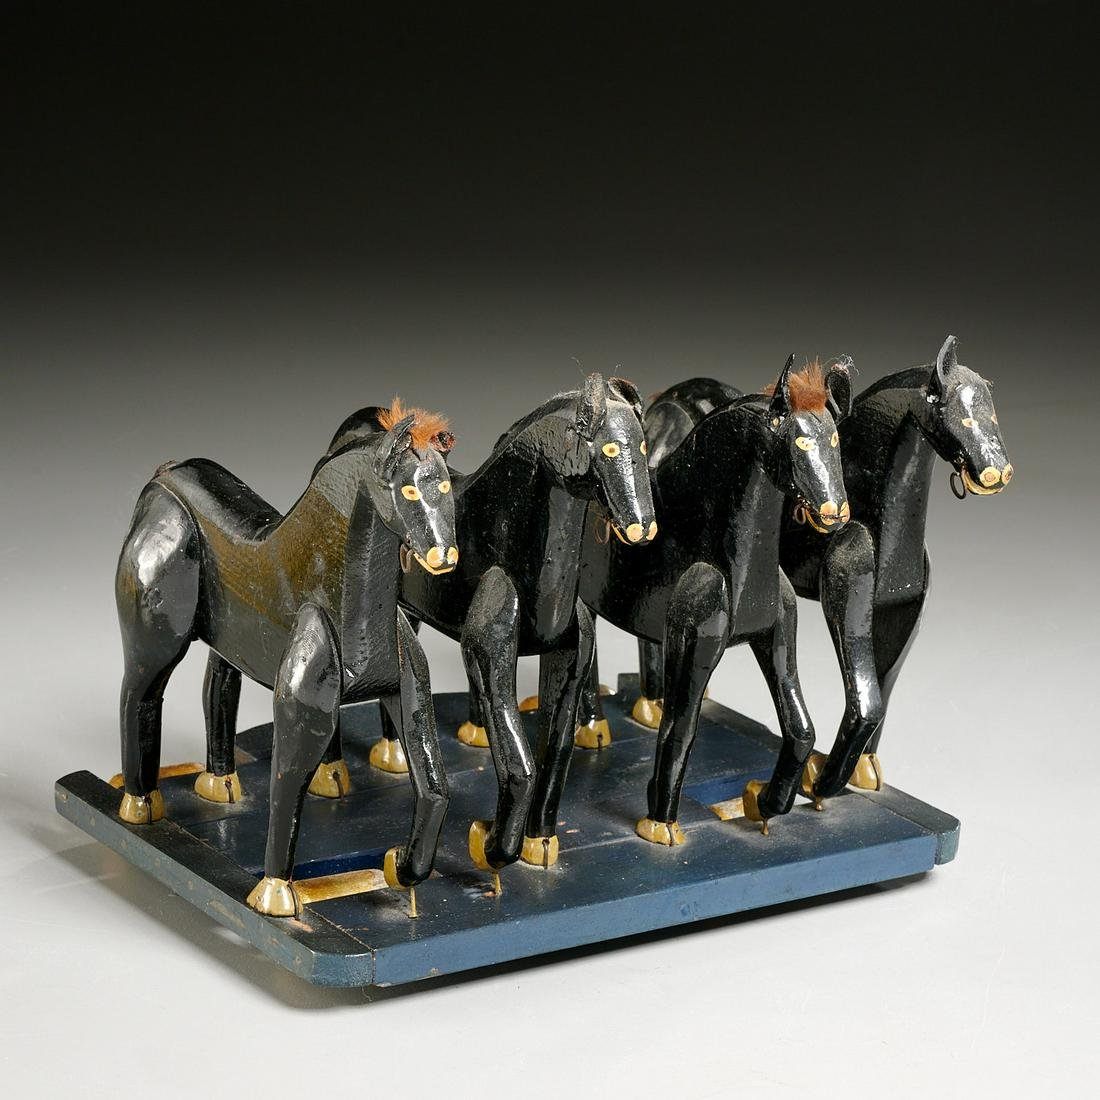 American Folk Art pull toy, four horse team